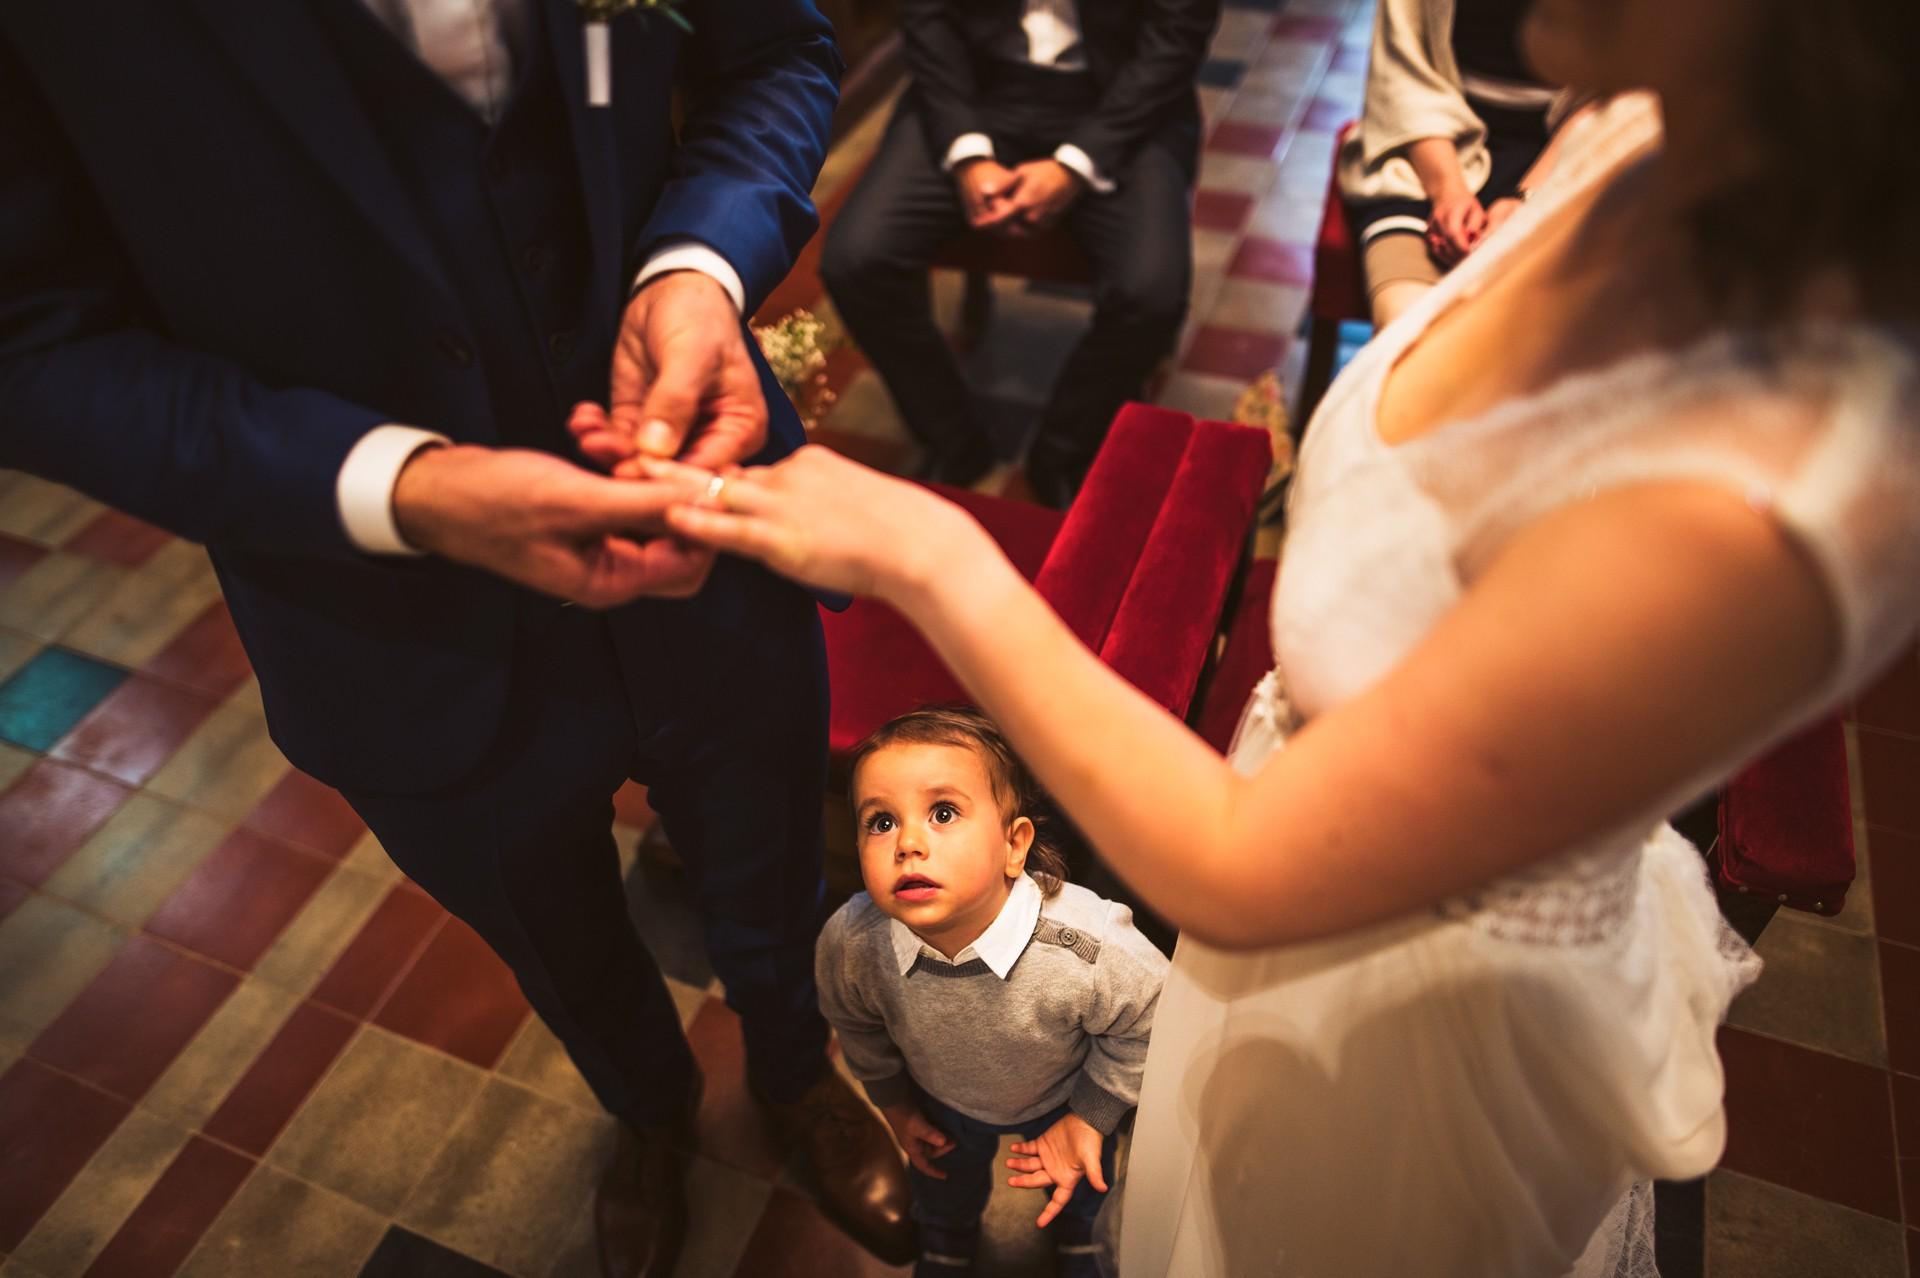 zbira fotografa za poroko (1)